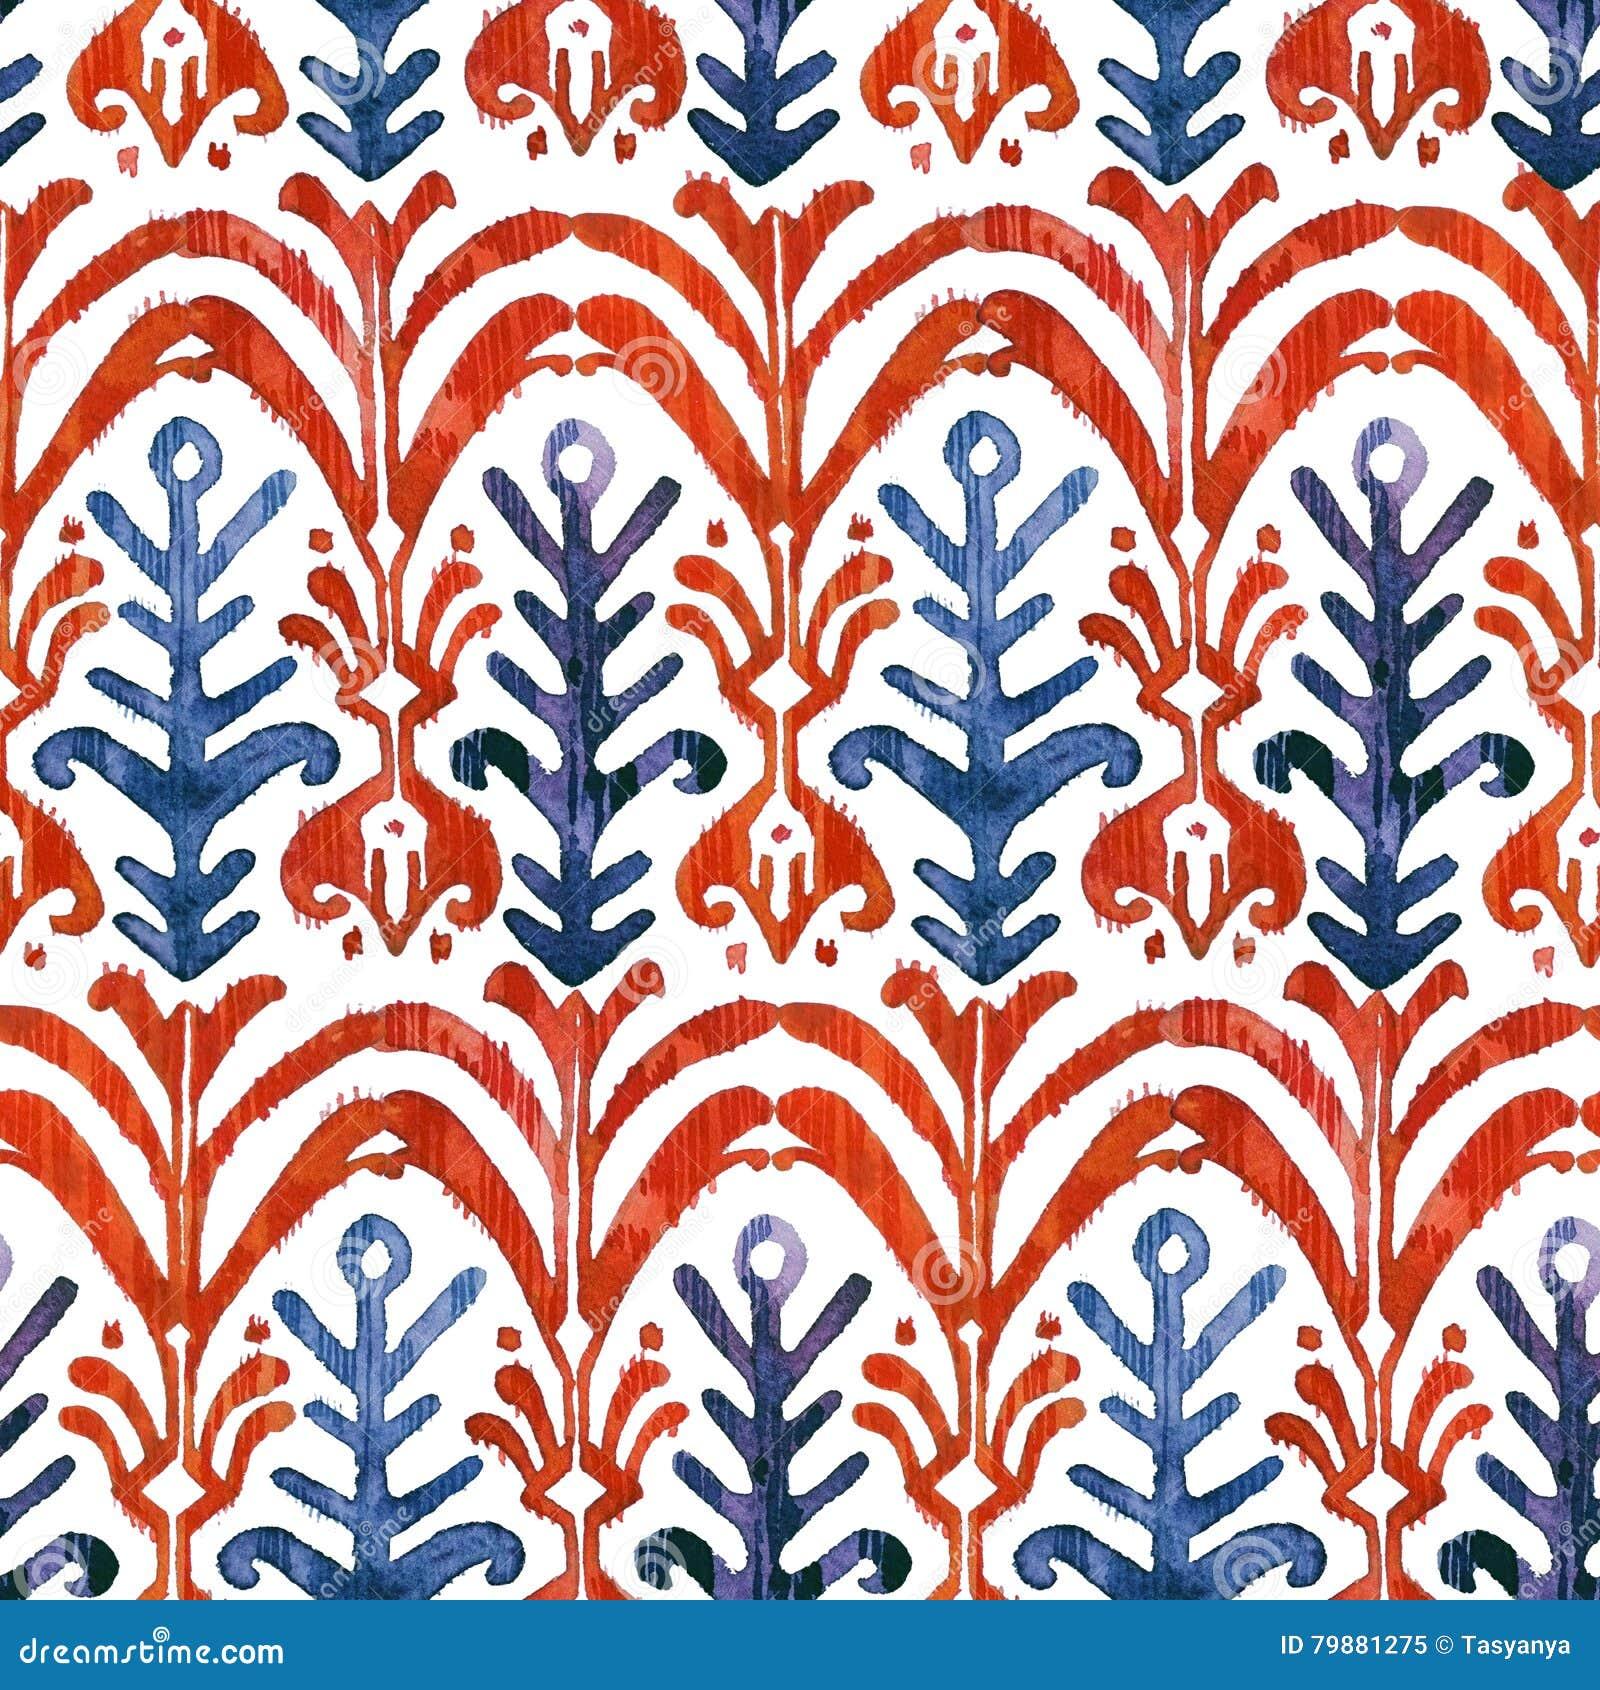 Ikat watercolor seamless pattern. Floral vibrant watercolour